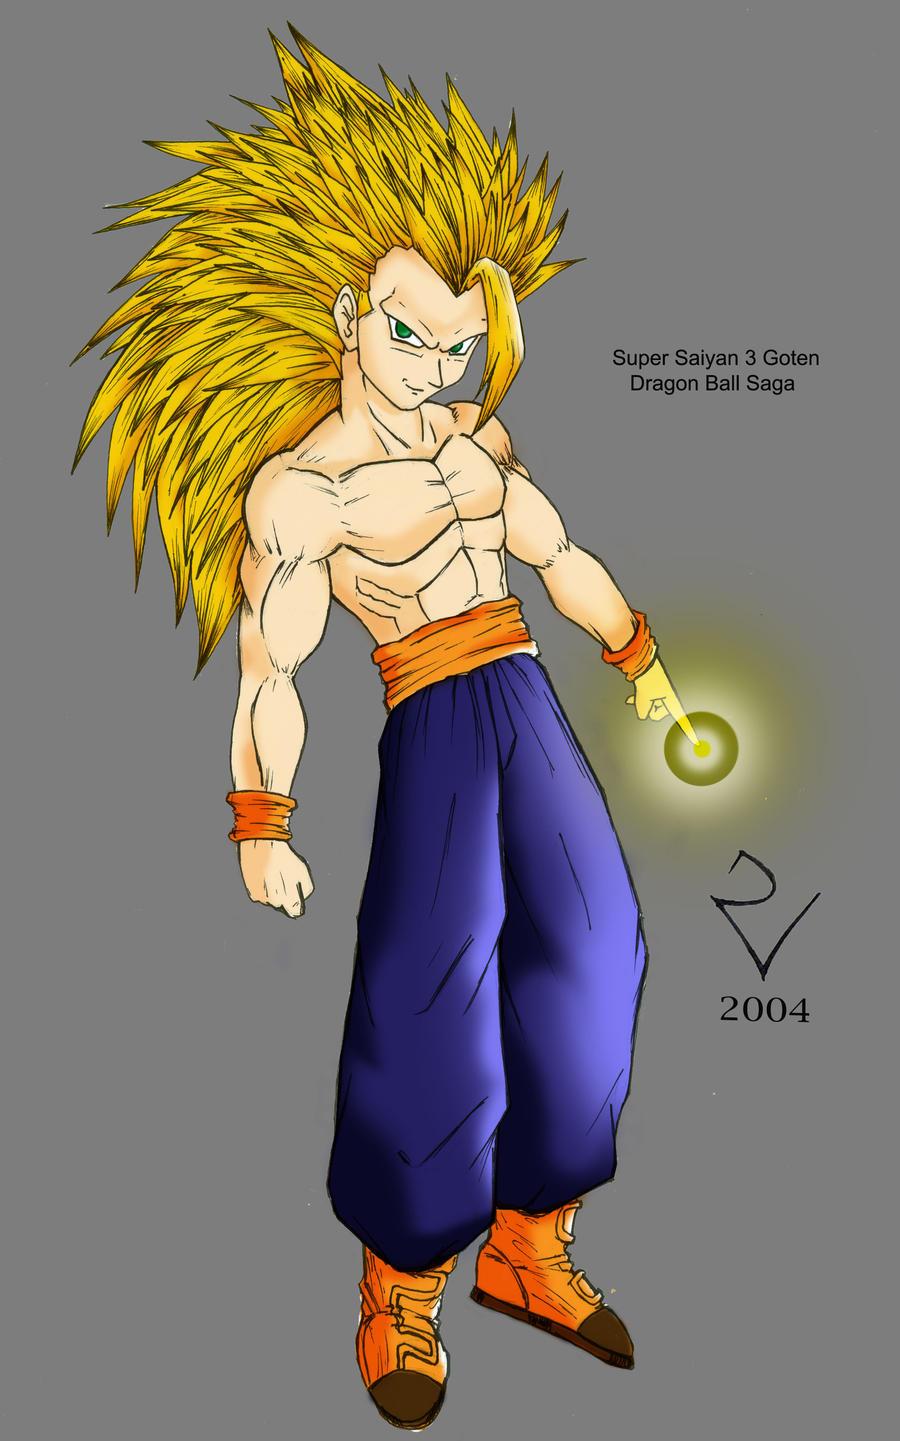 Super saiyan 3 goten by kaninraider on deviantart - Sangohan super saiyan 3 ...